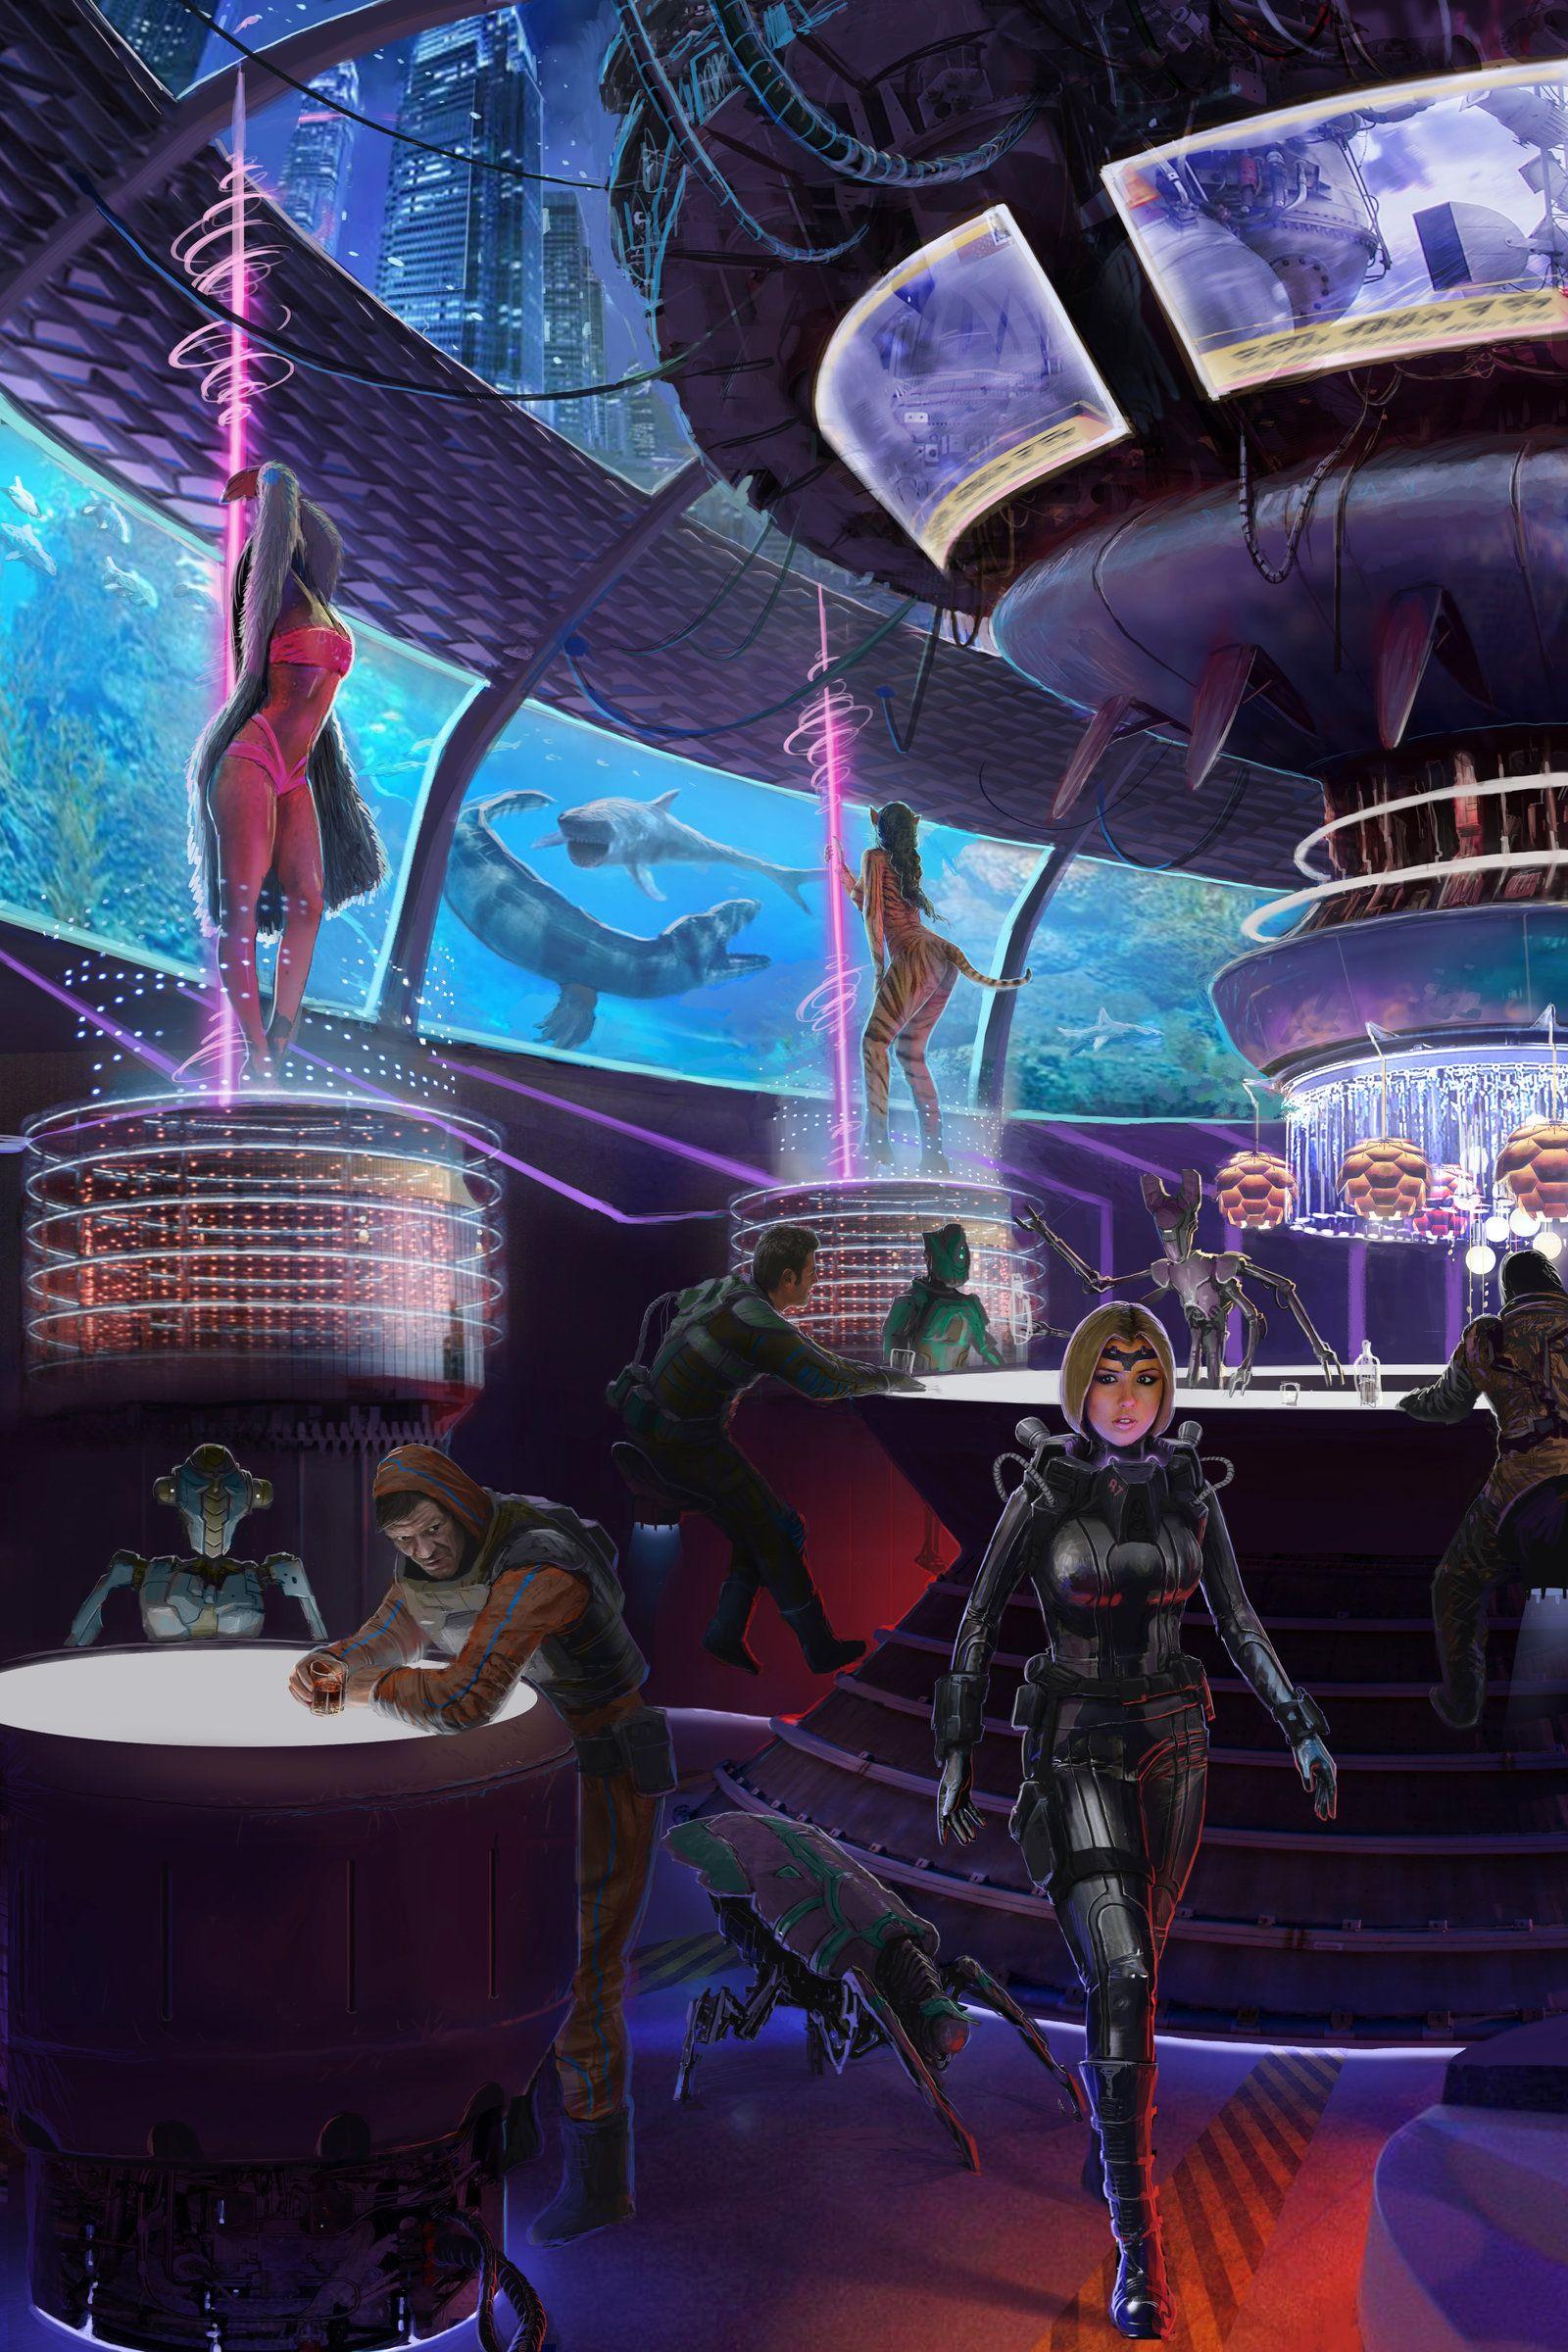 Retro Sci-fi by mechagidrah3 on DeviantArt